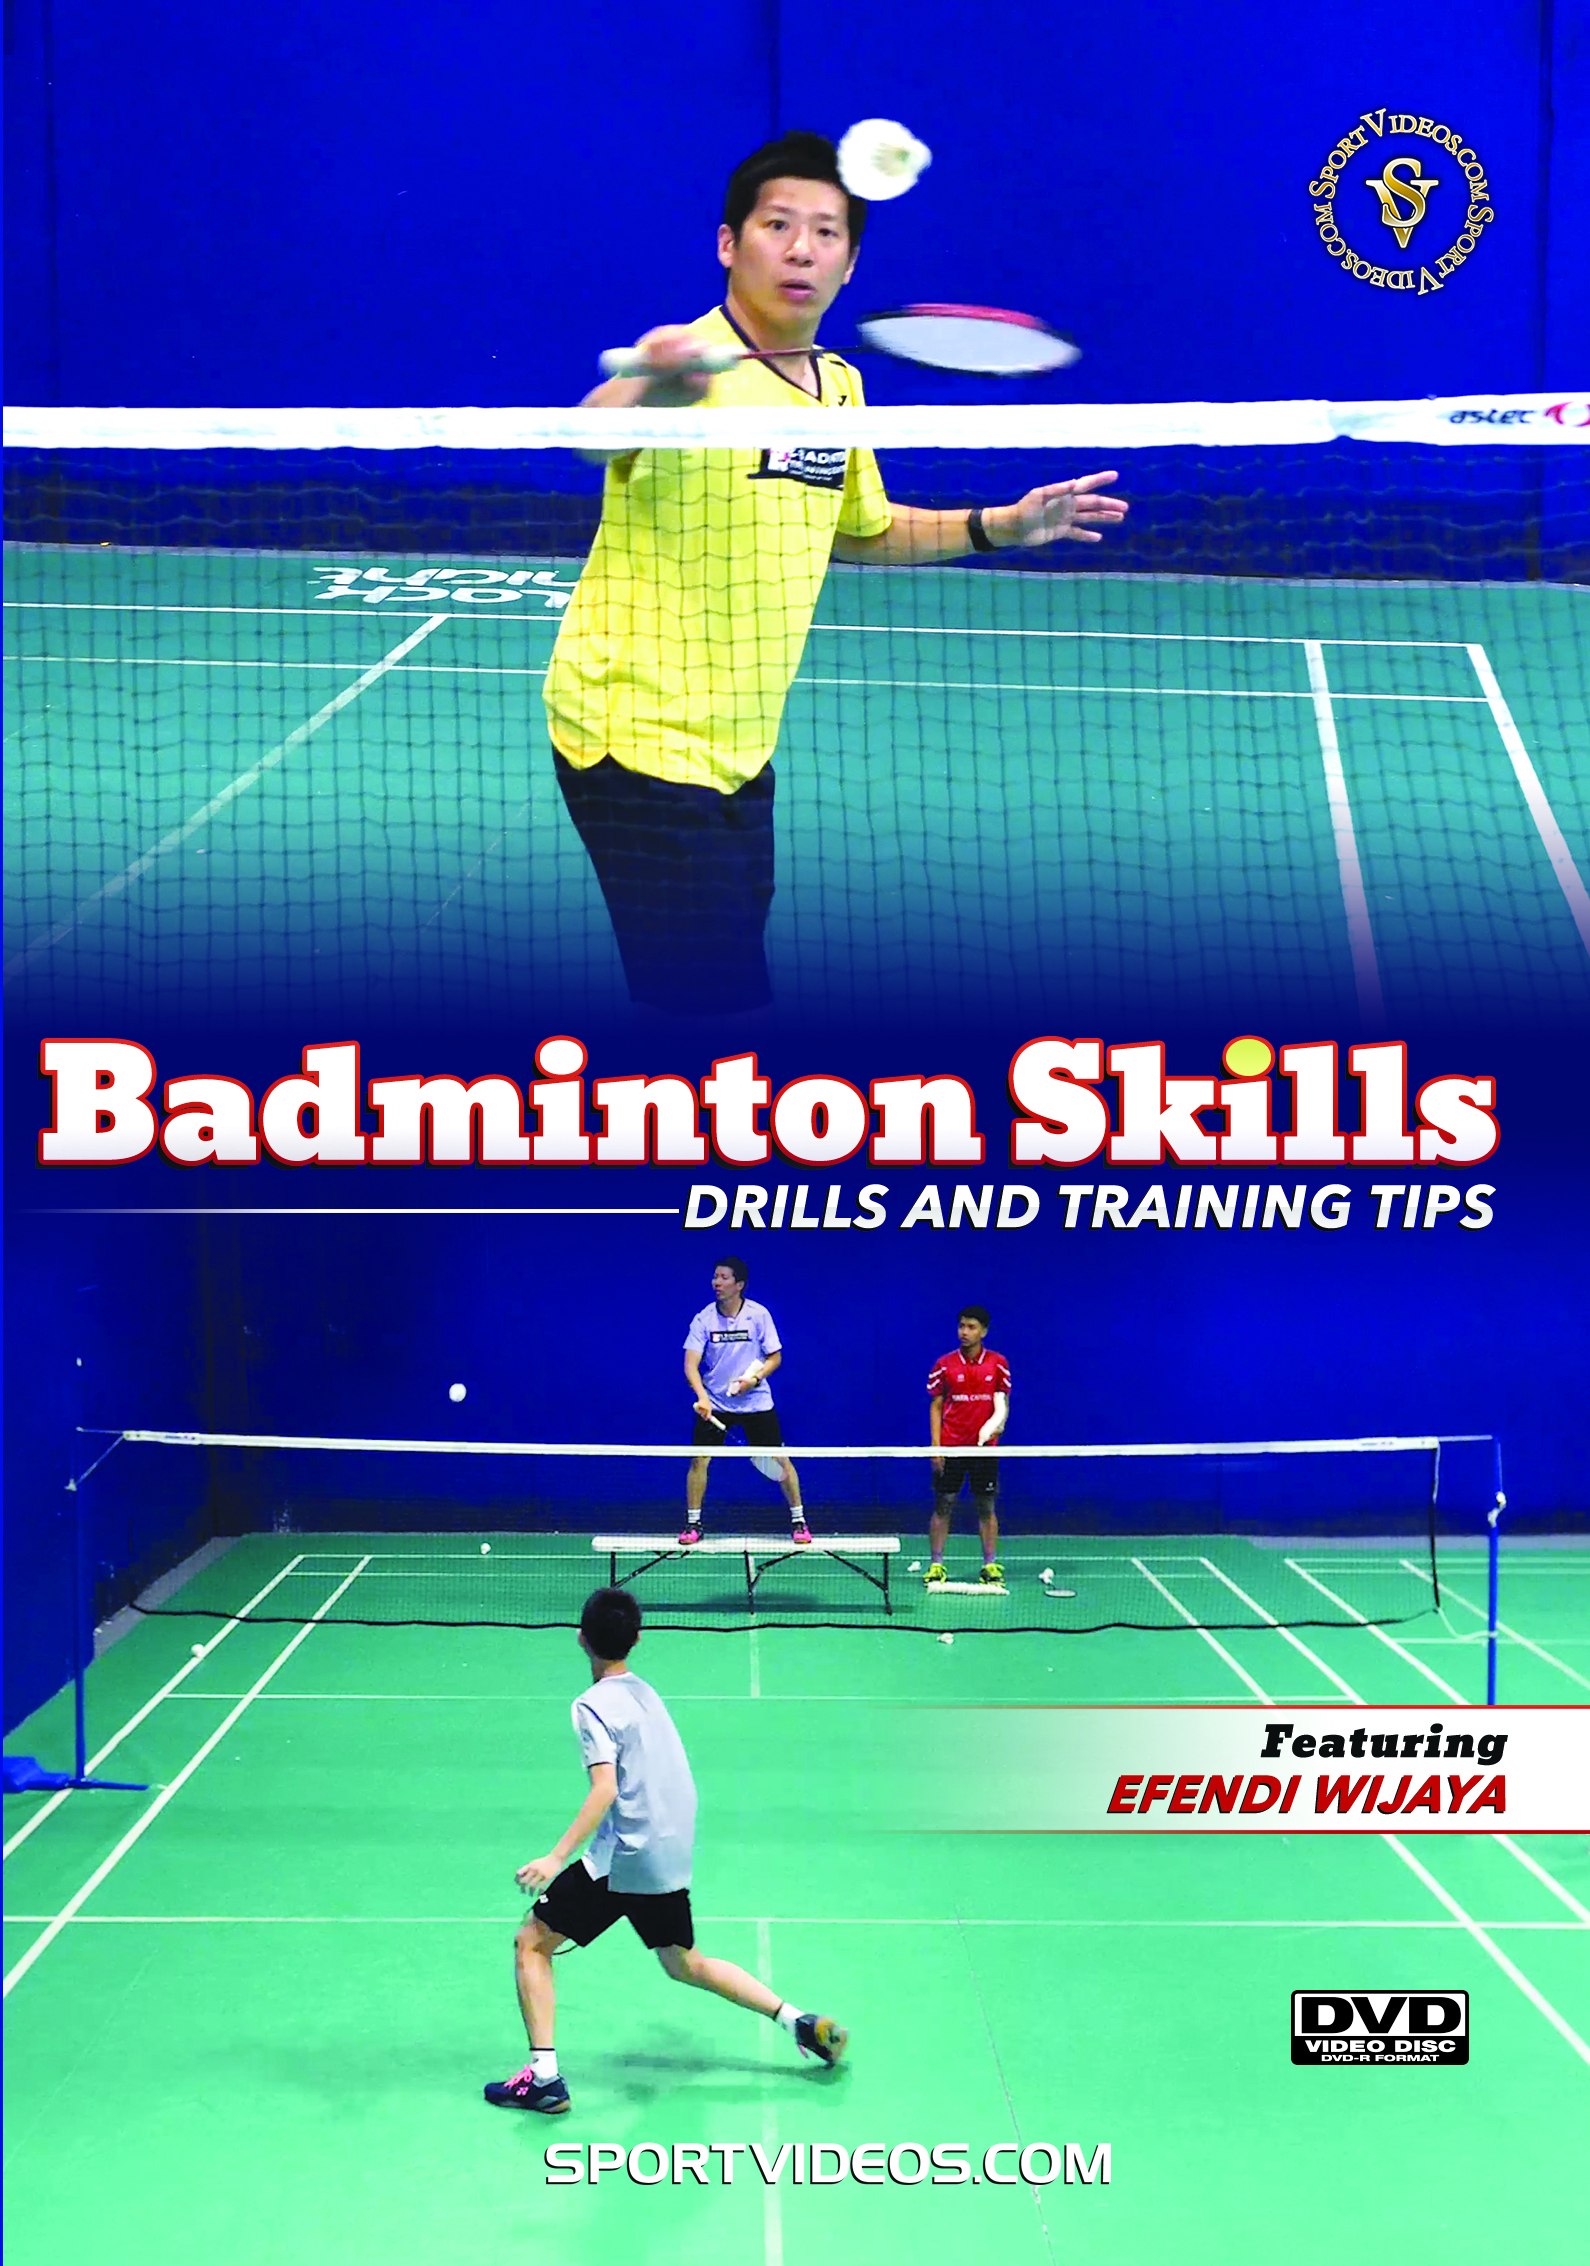 Badminton Skills, Drills and Training Tips *Streaming link*